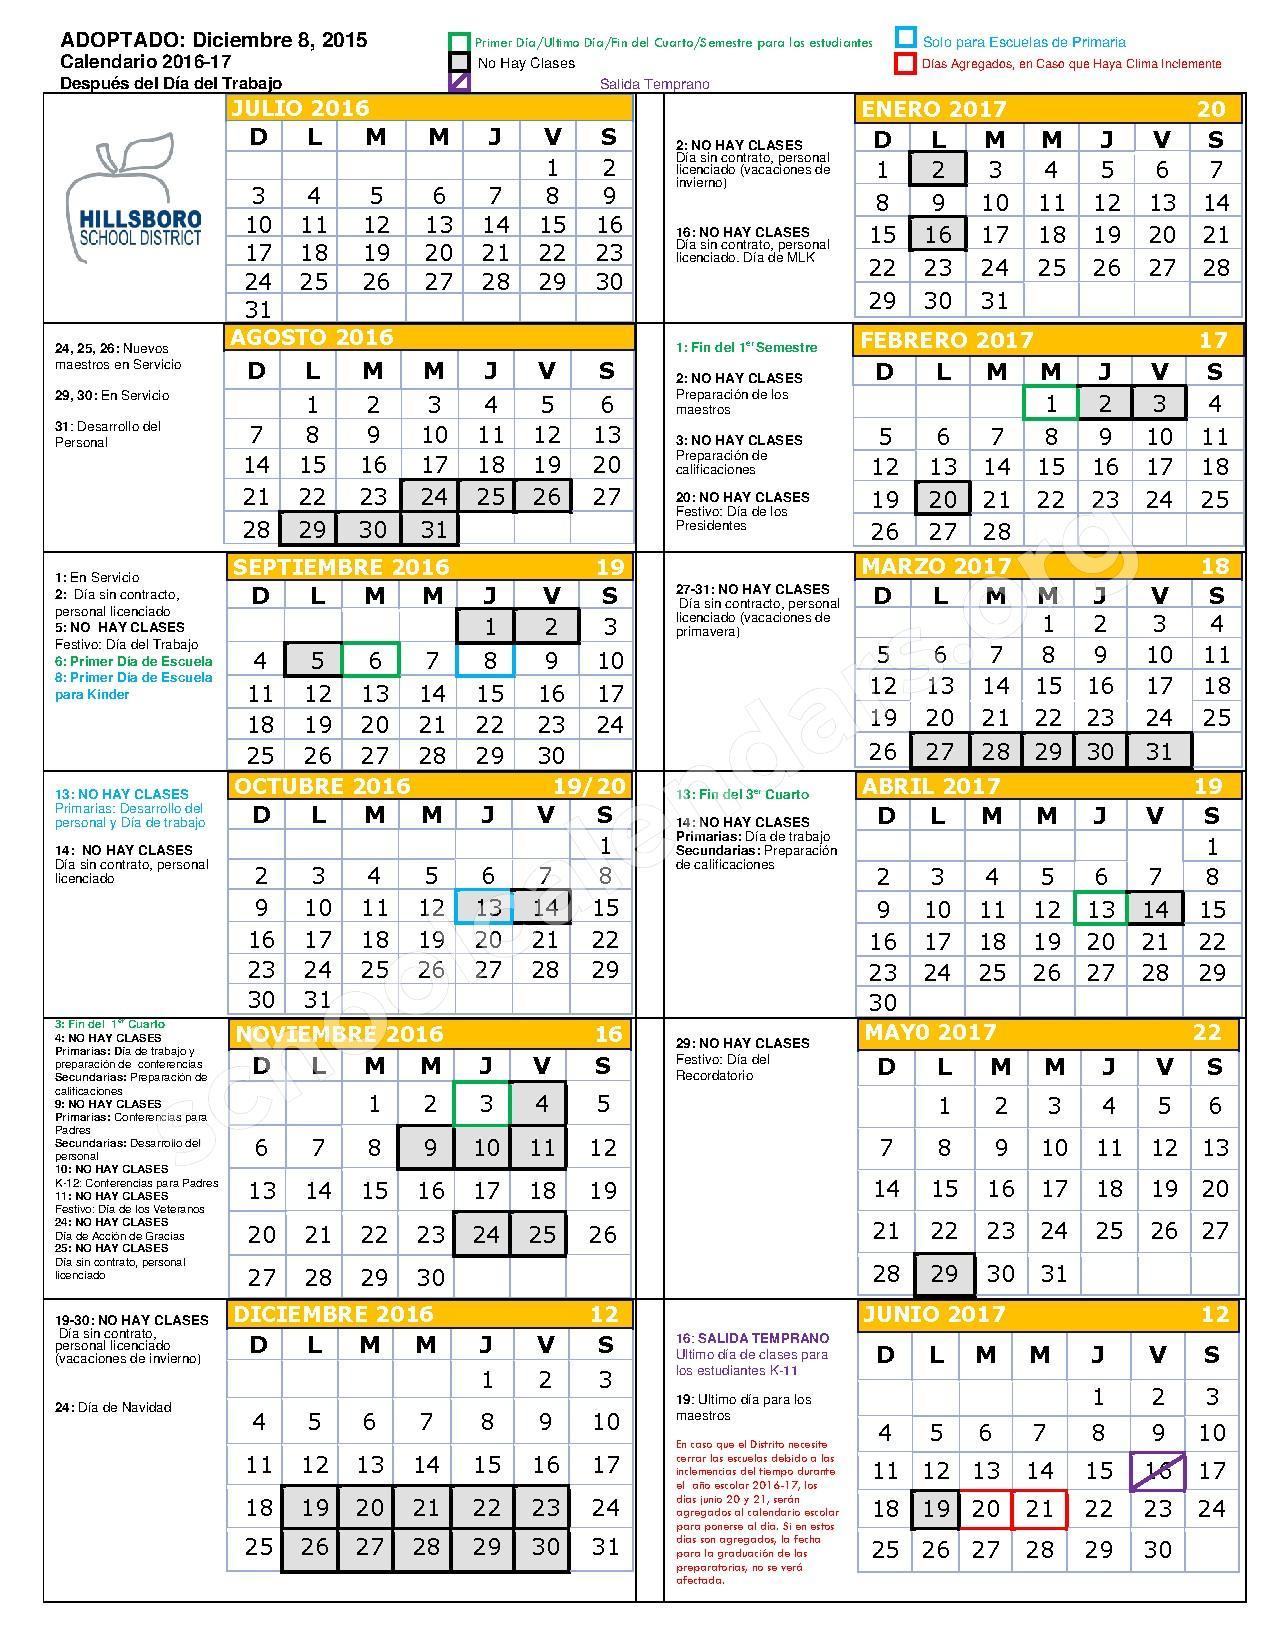 2016 - 2017 Calendario Escolar – Hillsboro School District  – page 1